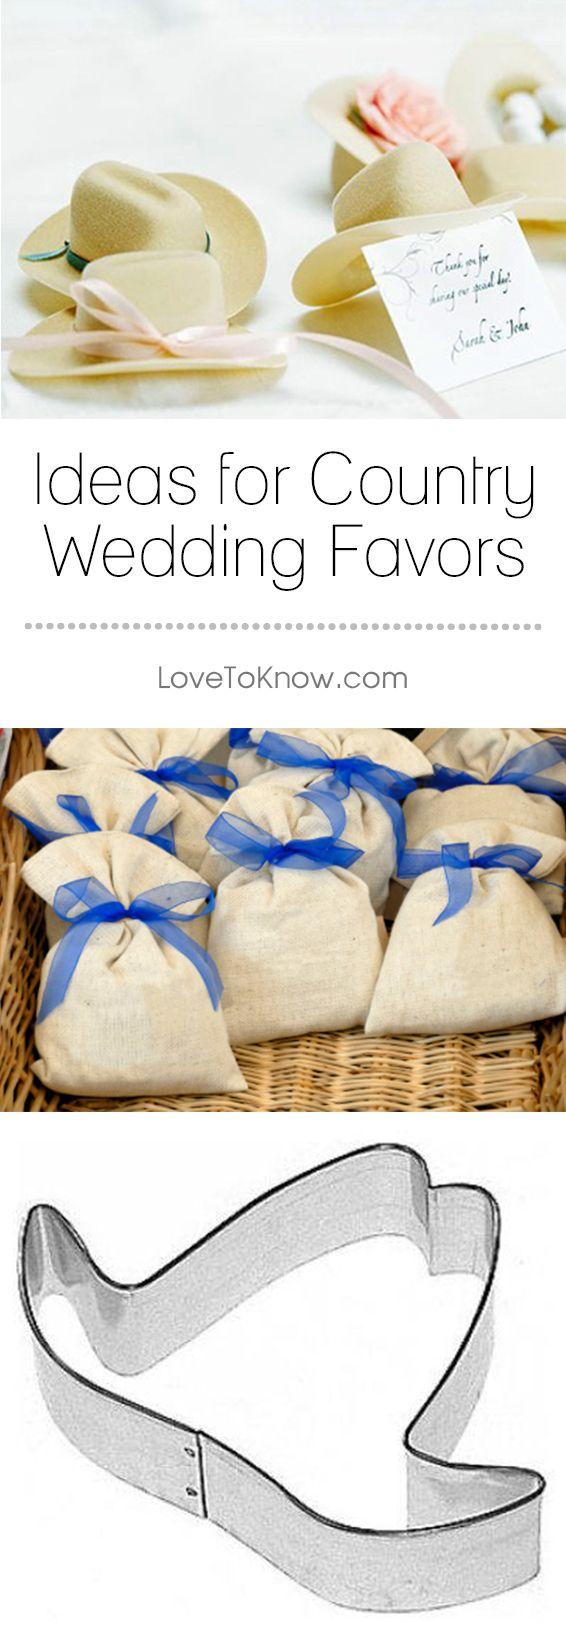 351 best Weddings images on Pinterest